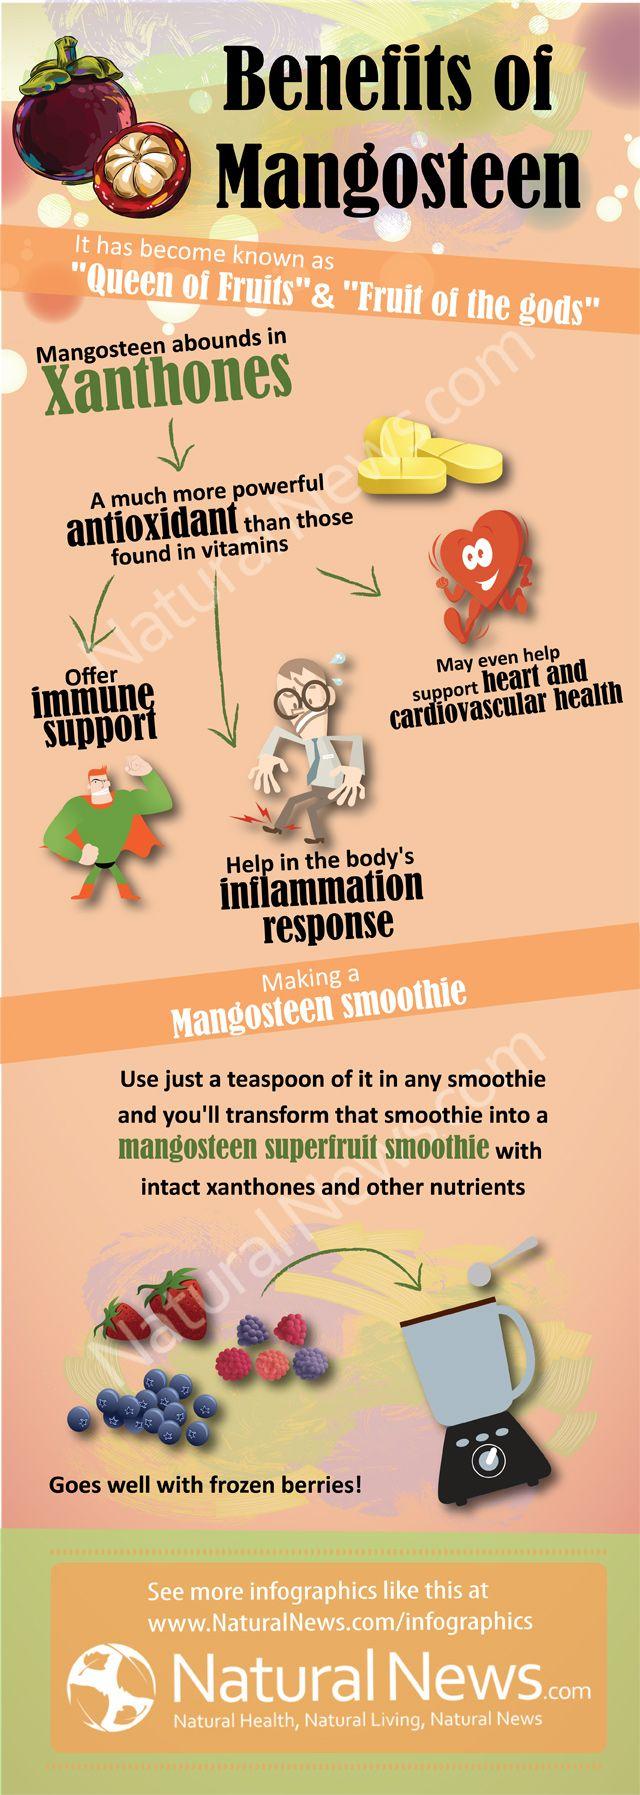 Health Benefits of Mangosteen, the Queen of Fruit. http://www.engineeredlifestyles.com/h/health-benefits-of-mangosteen.html #mangosteen #health